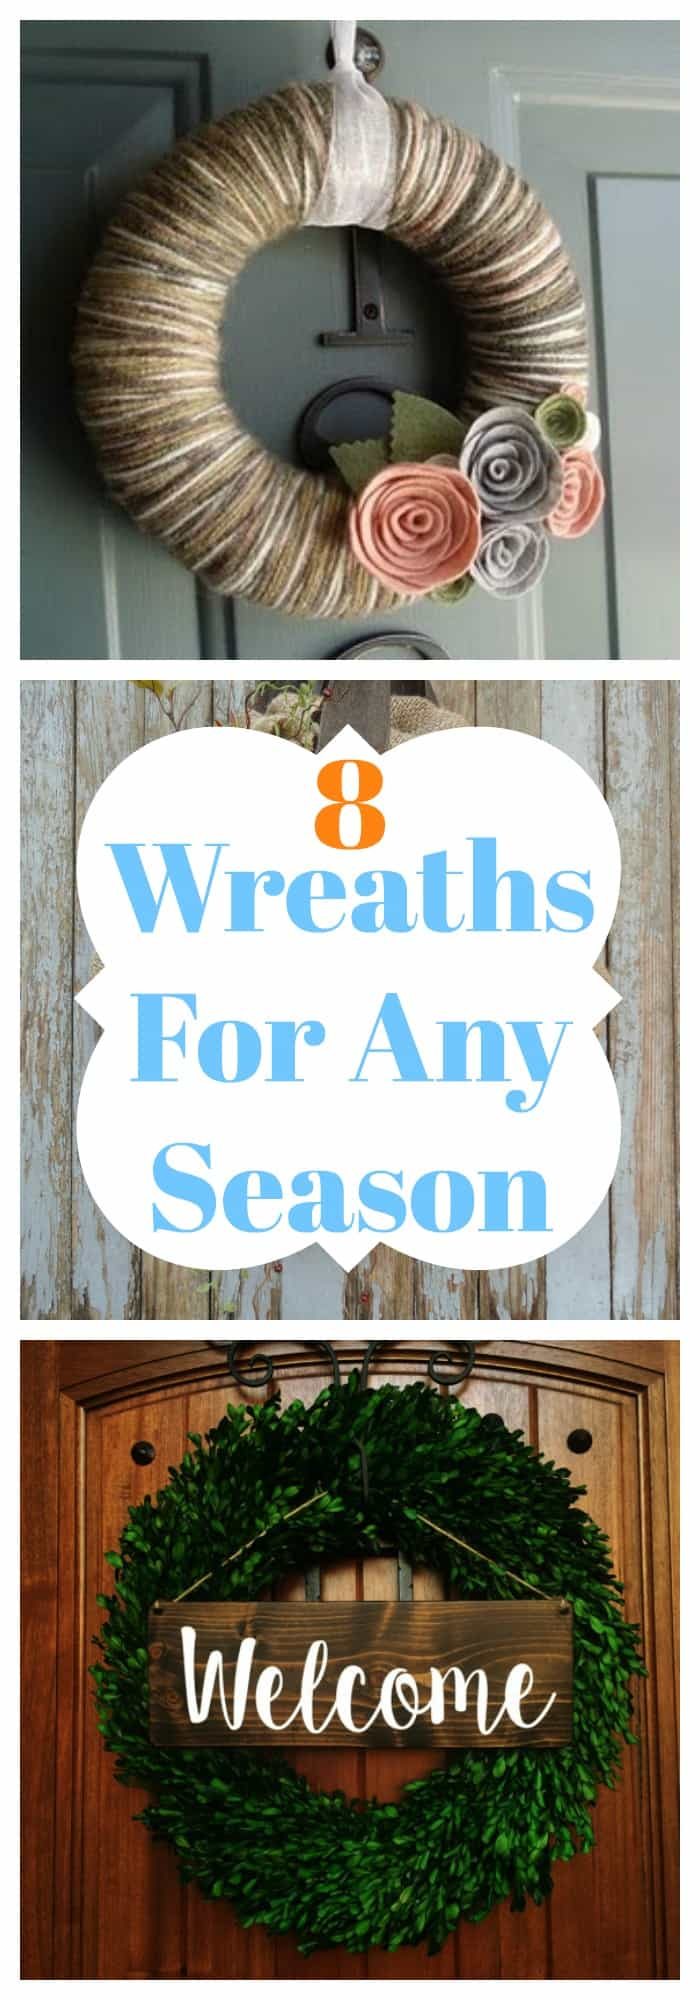 DIY-8 Wreaths For Any Season-The Organized Mom